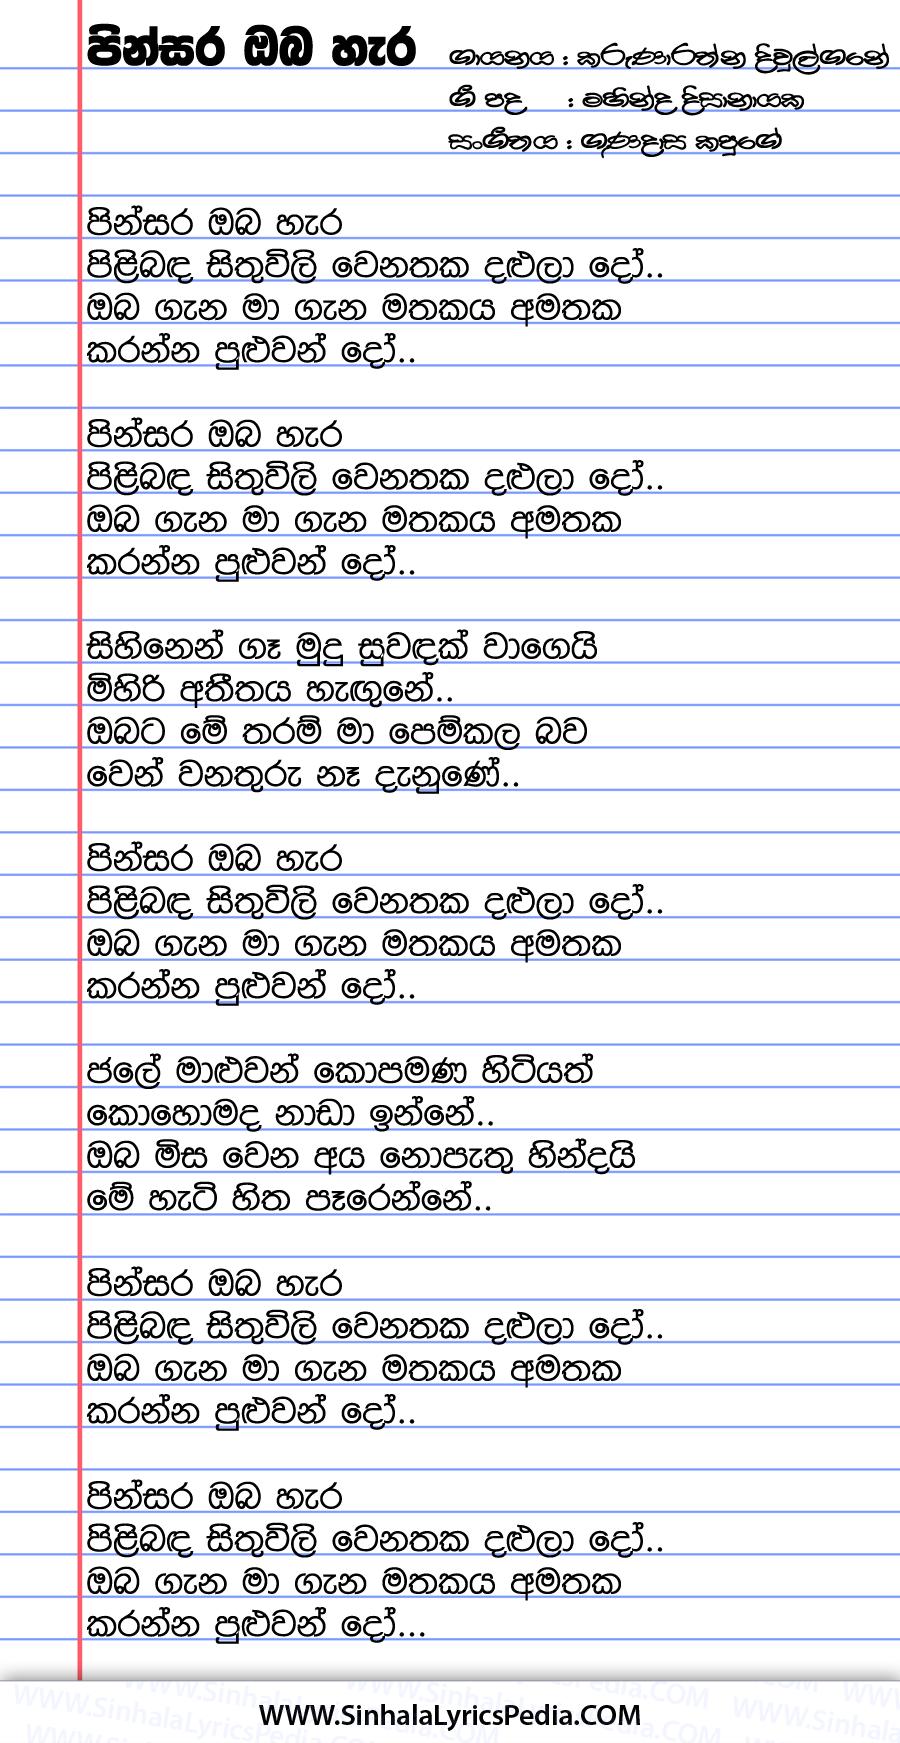 Pinsara Oba Hara Pilibanda Sithuwili Song Lyrics